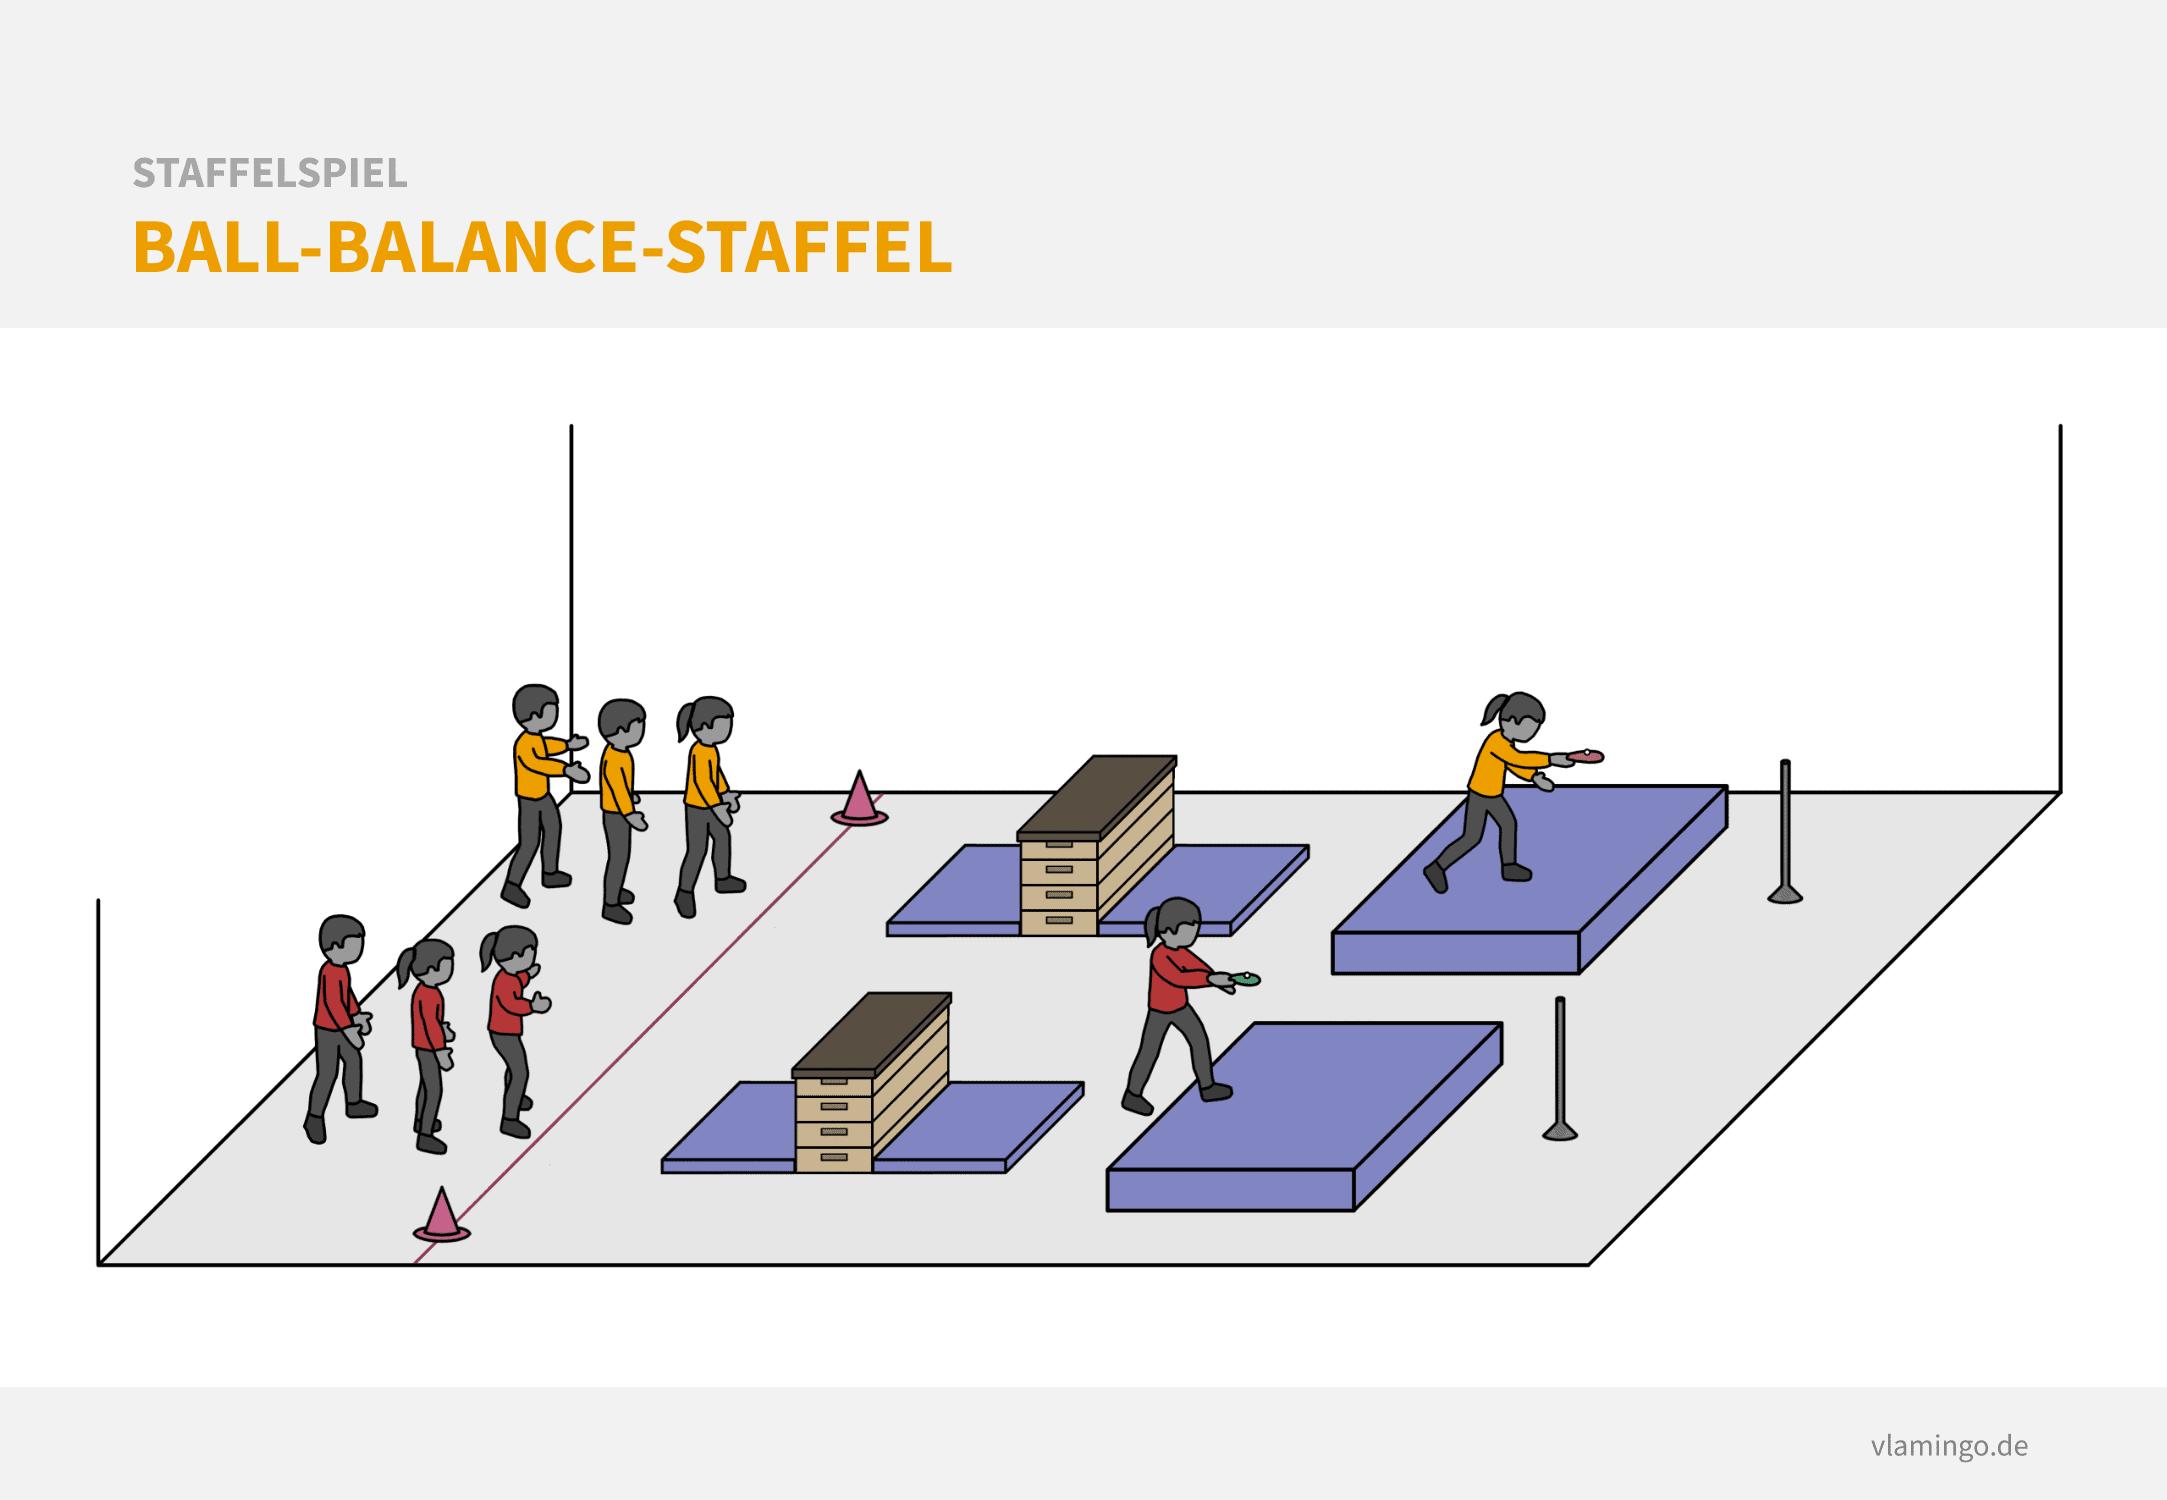 Staffelspiel - Ball-Balance-Staffel